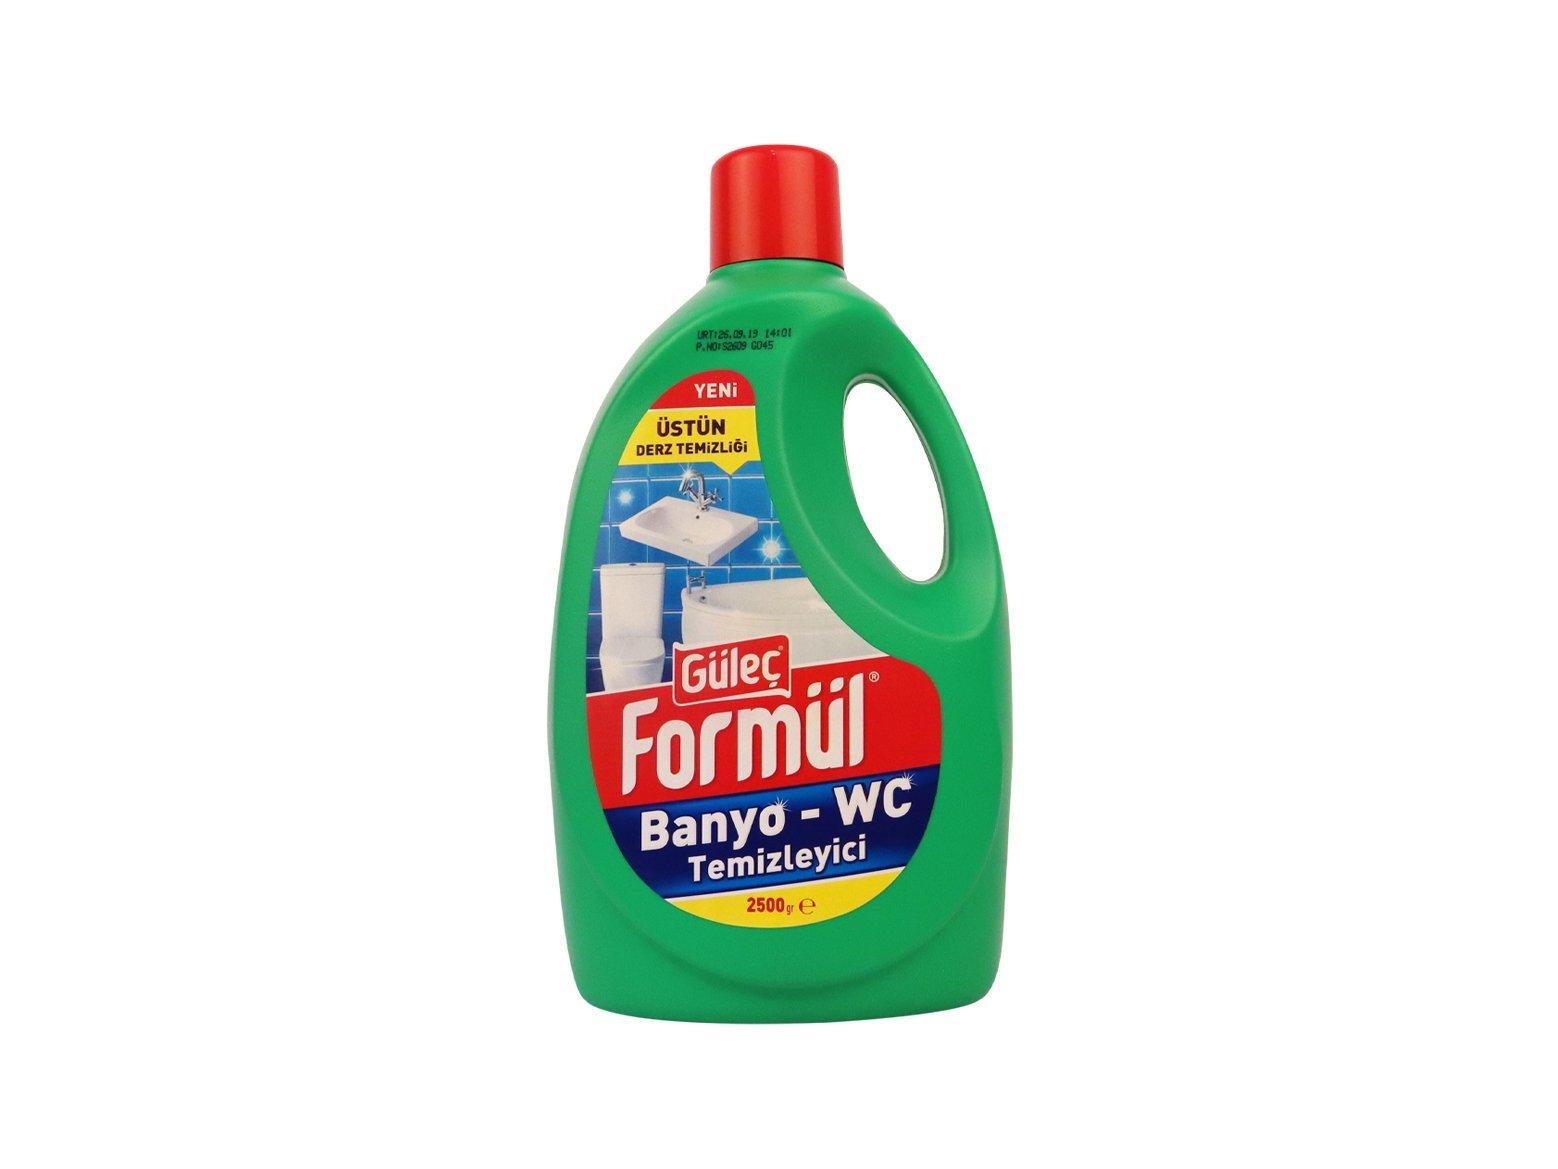 Formül Banyo-Wc Parlatıcı 2500 ml